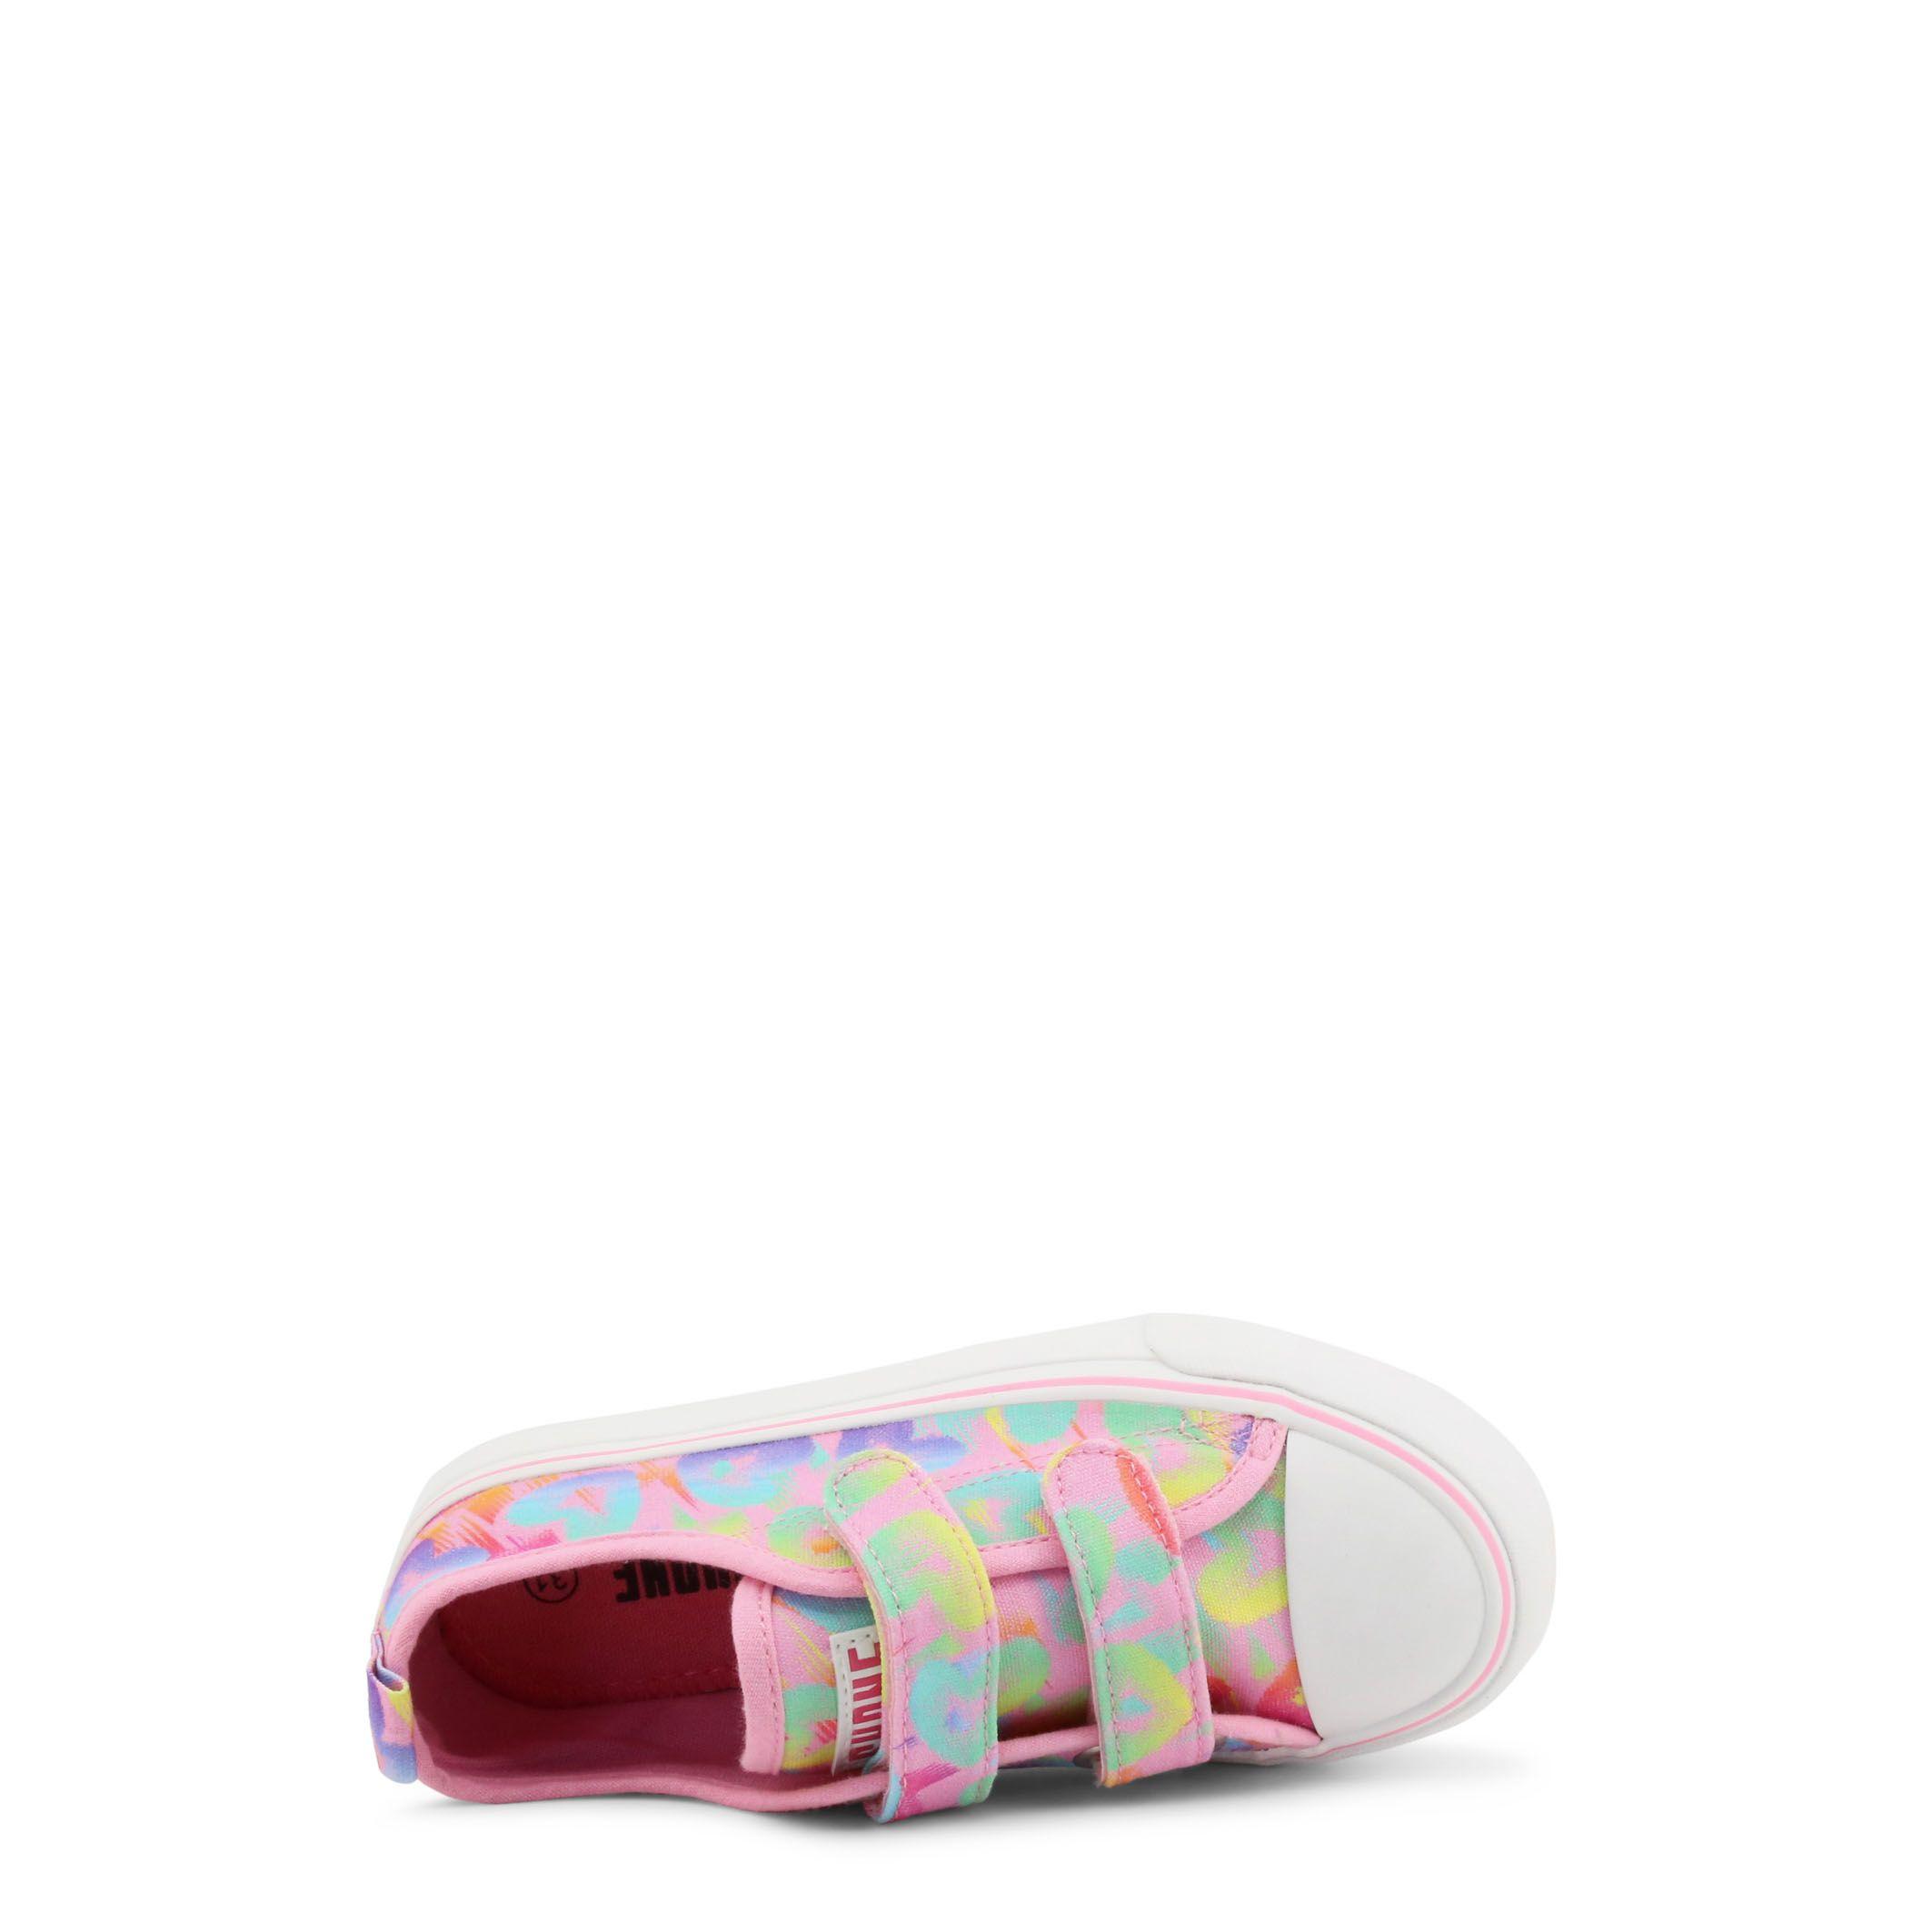 Shone – 291-001 – Roze Designeritems.nl